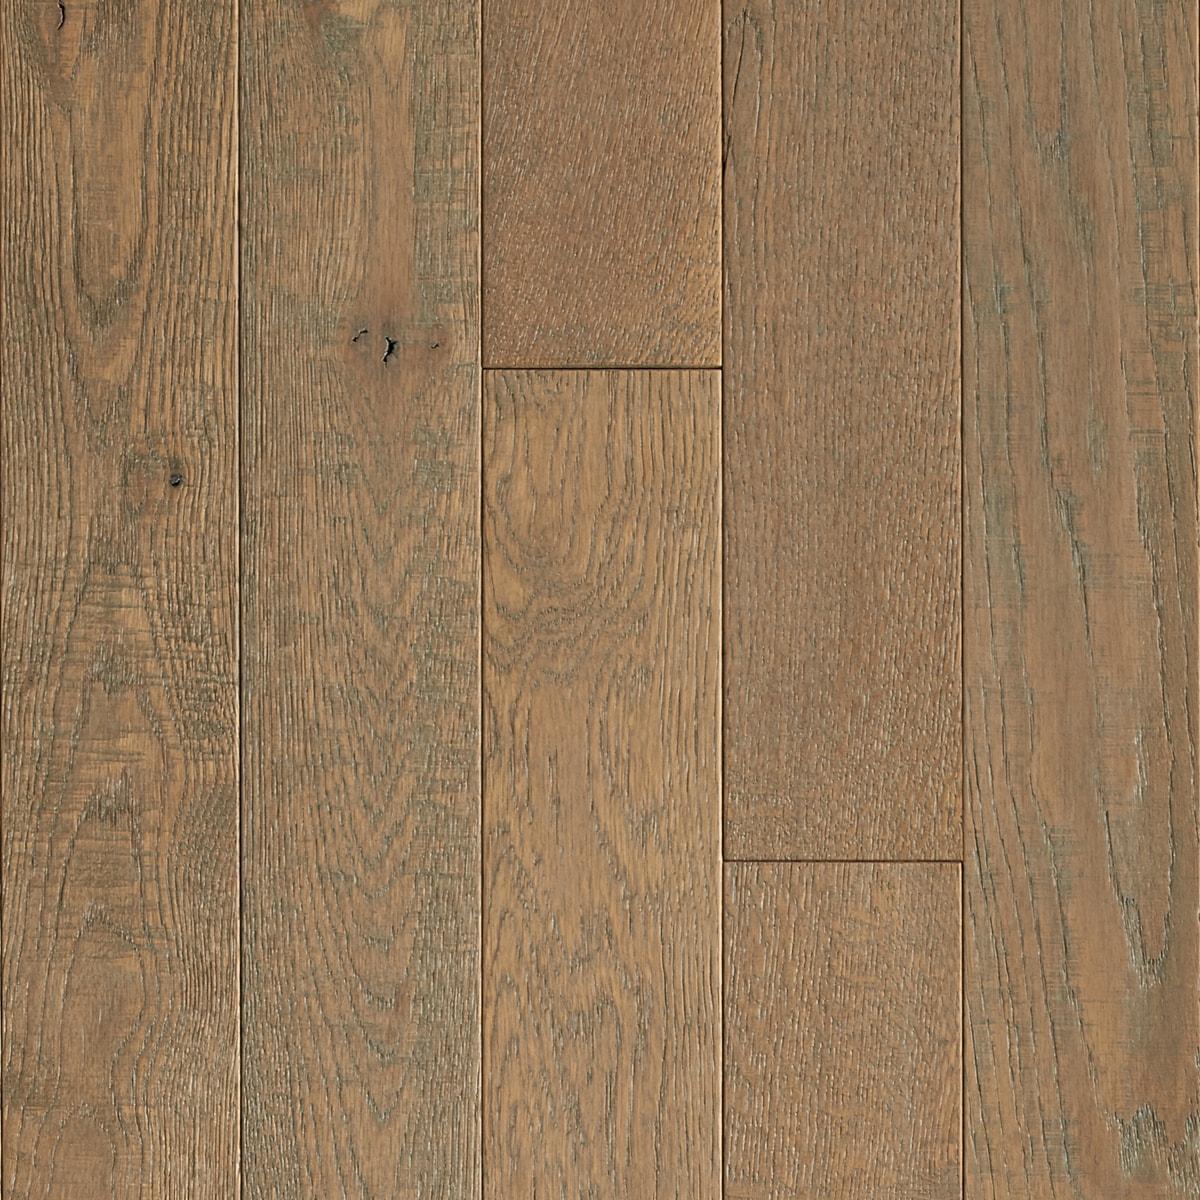 Hampshire hardwood floor